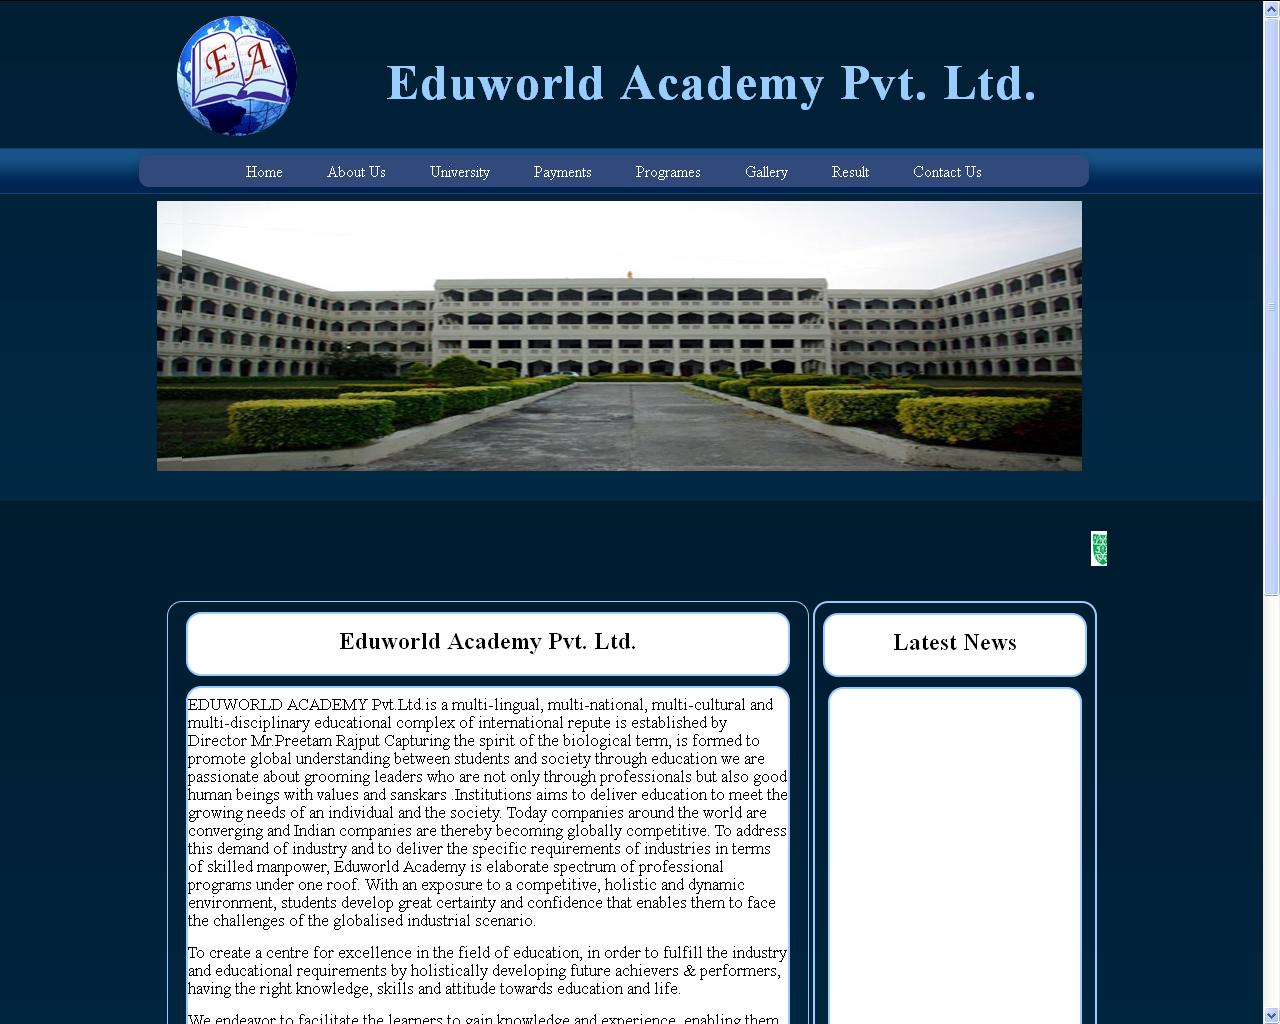 Eduworld Academy Site